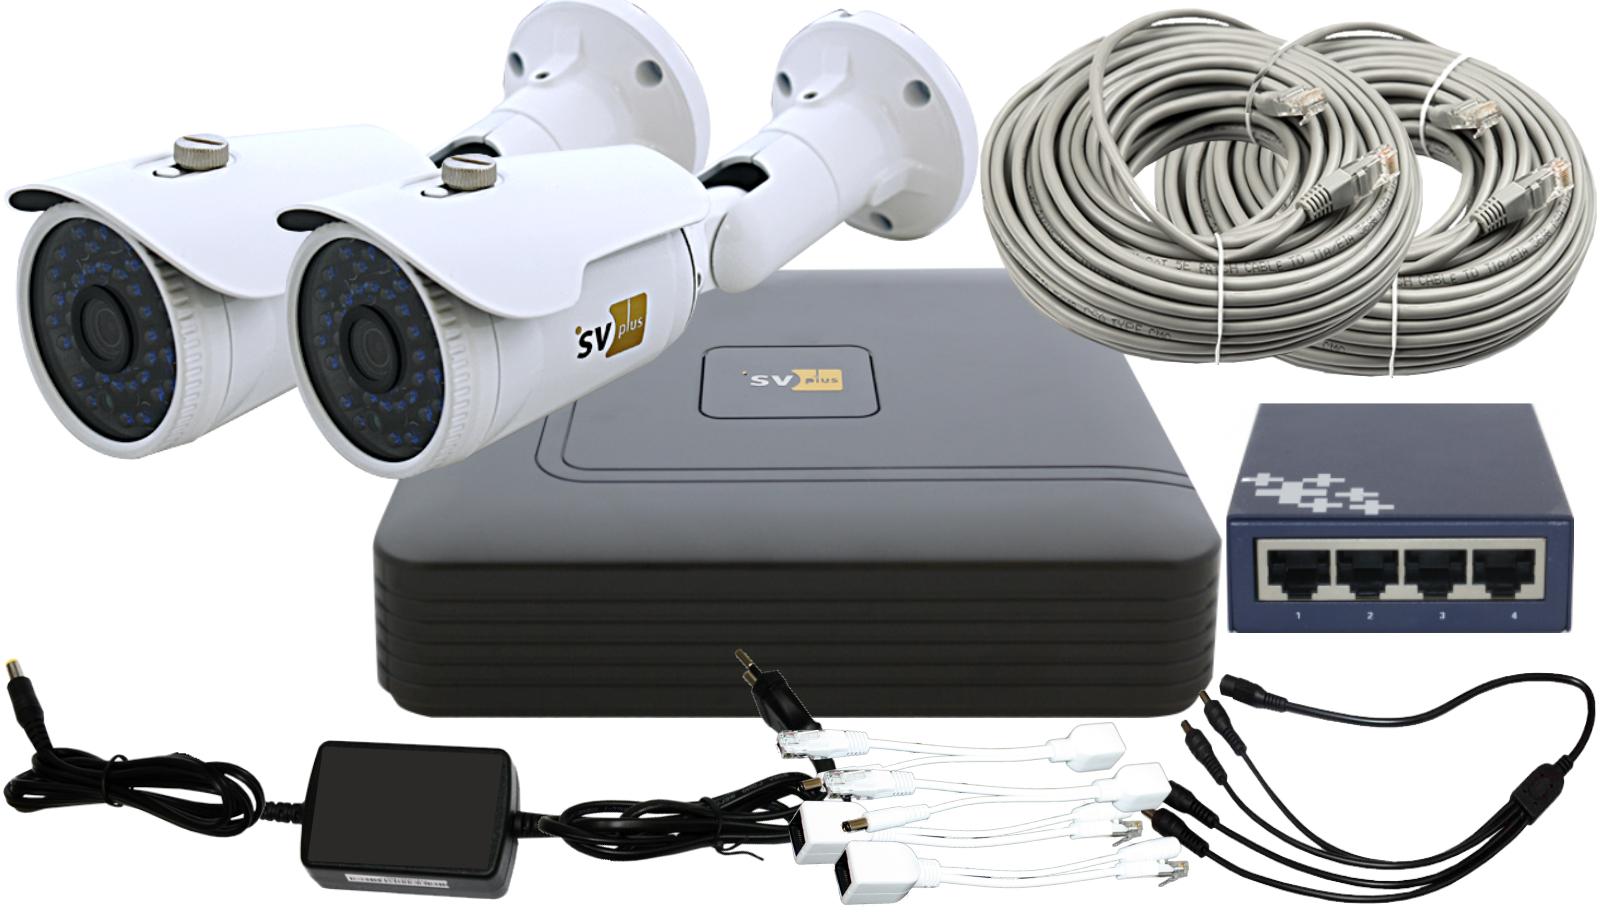 Комплект видеонаблюдения Svplus Svip-kit202s